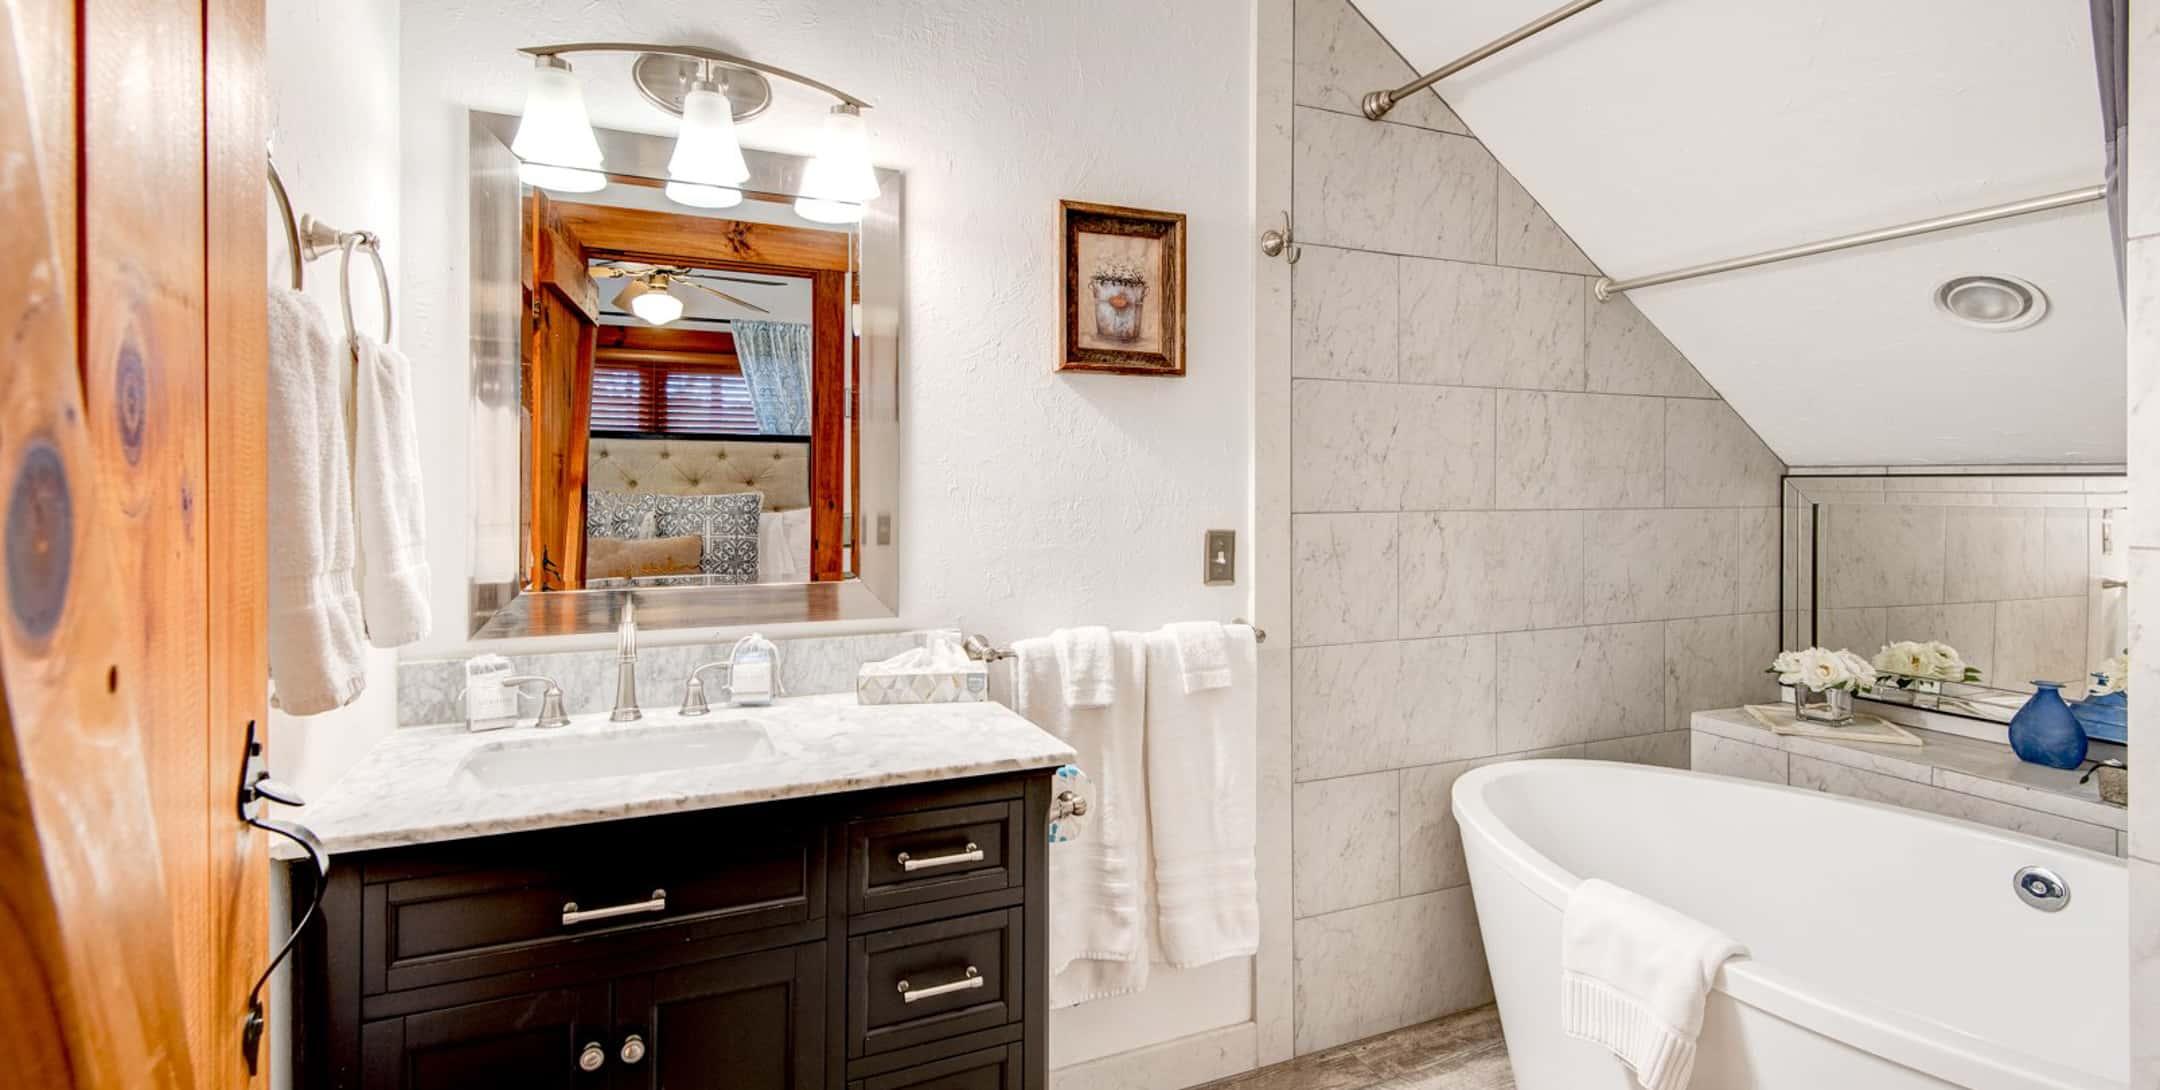 Raspberry Hill bathroom with a large deep soaking tub